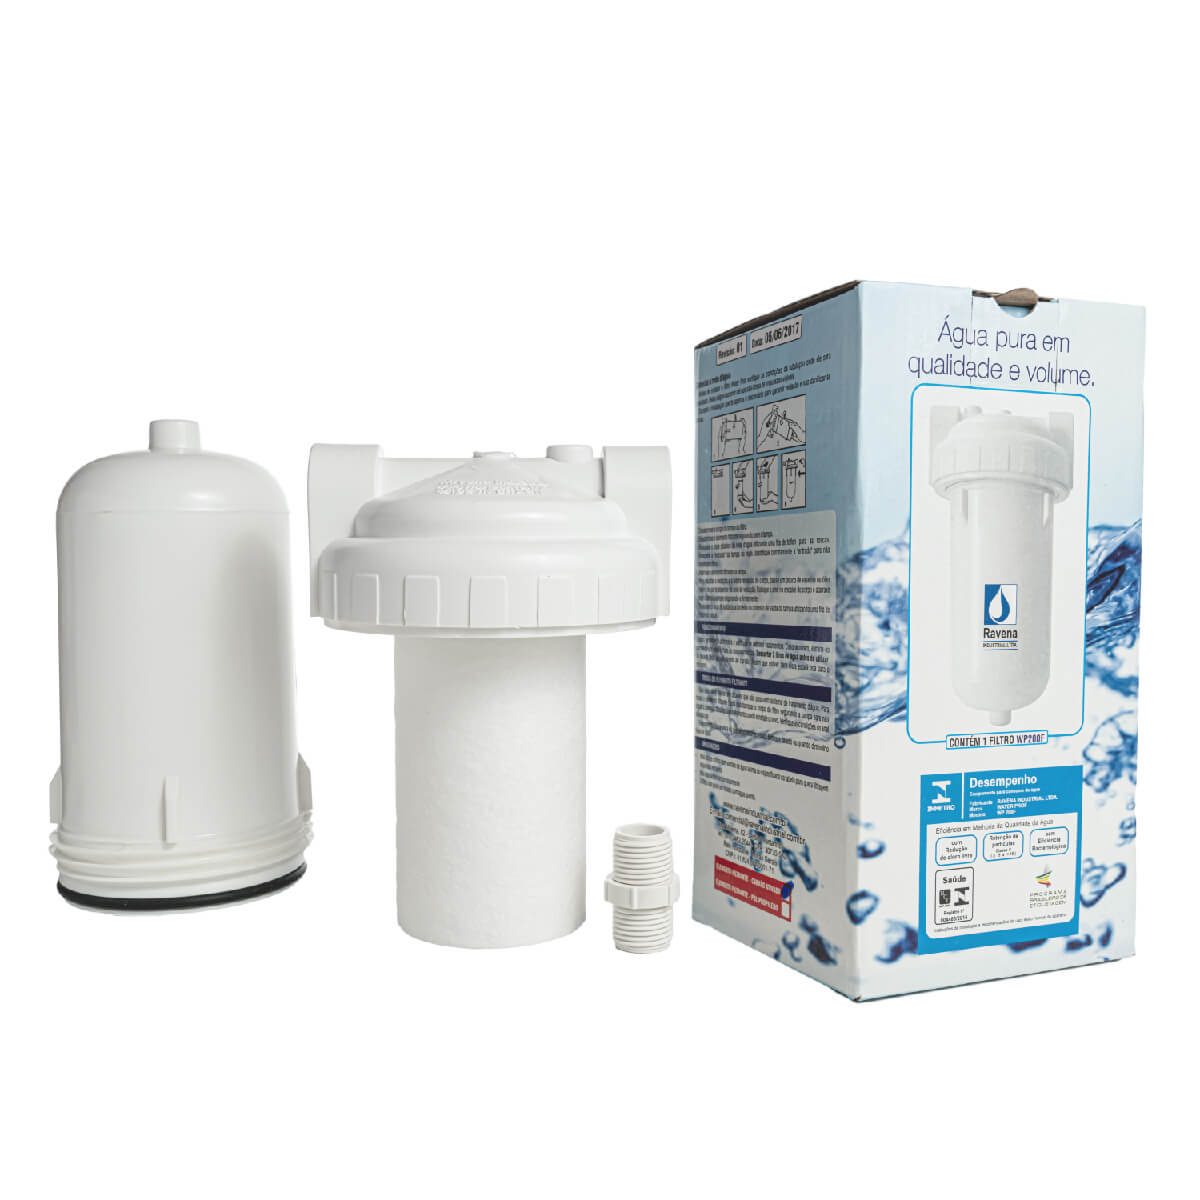 Filtro e Purificador de água Ravena WP 200F com elemento de polipropileno